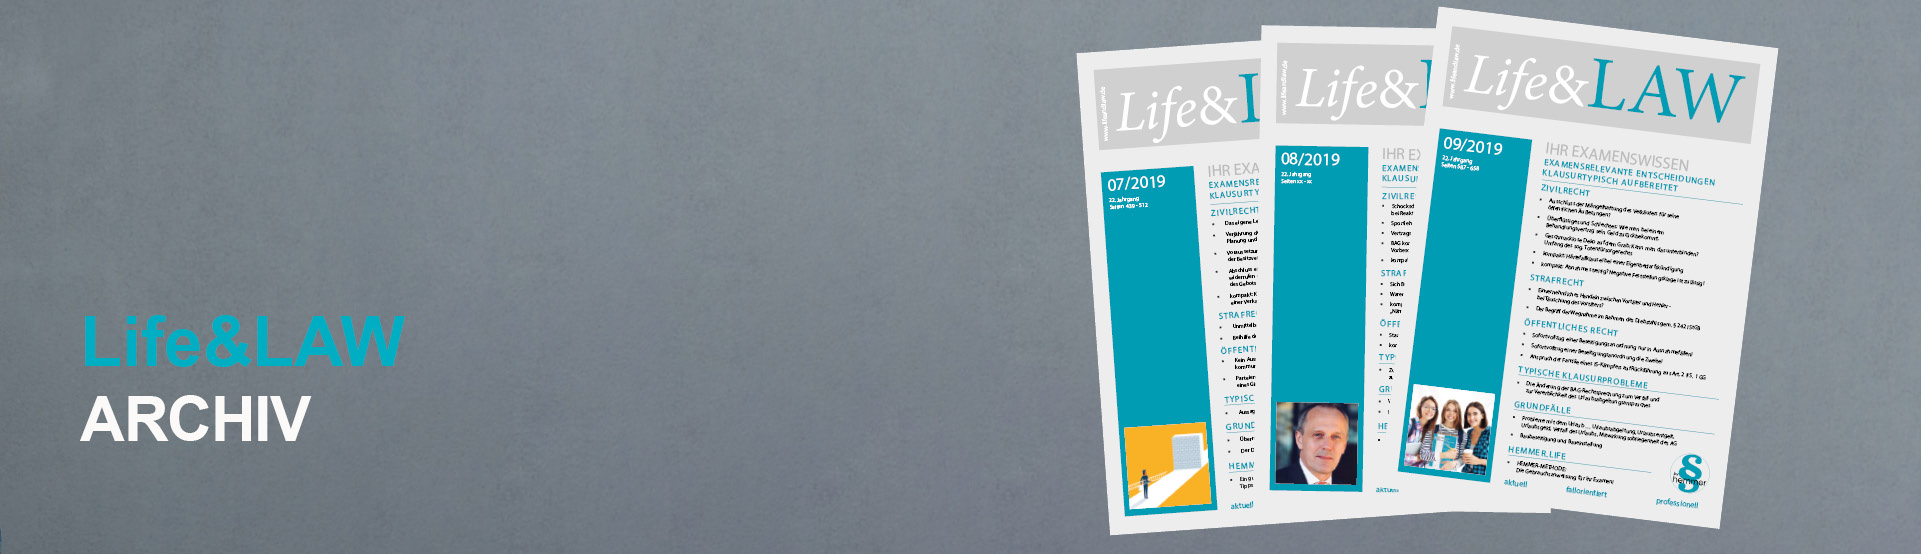 Life&LAW Archiv